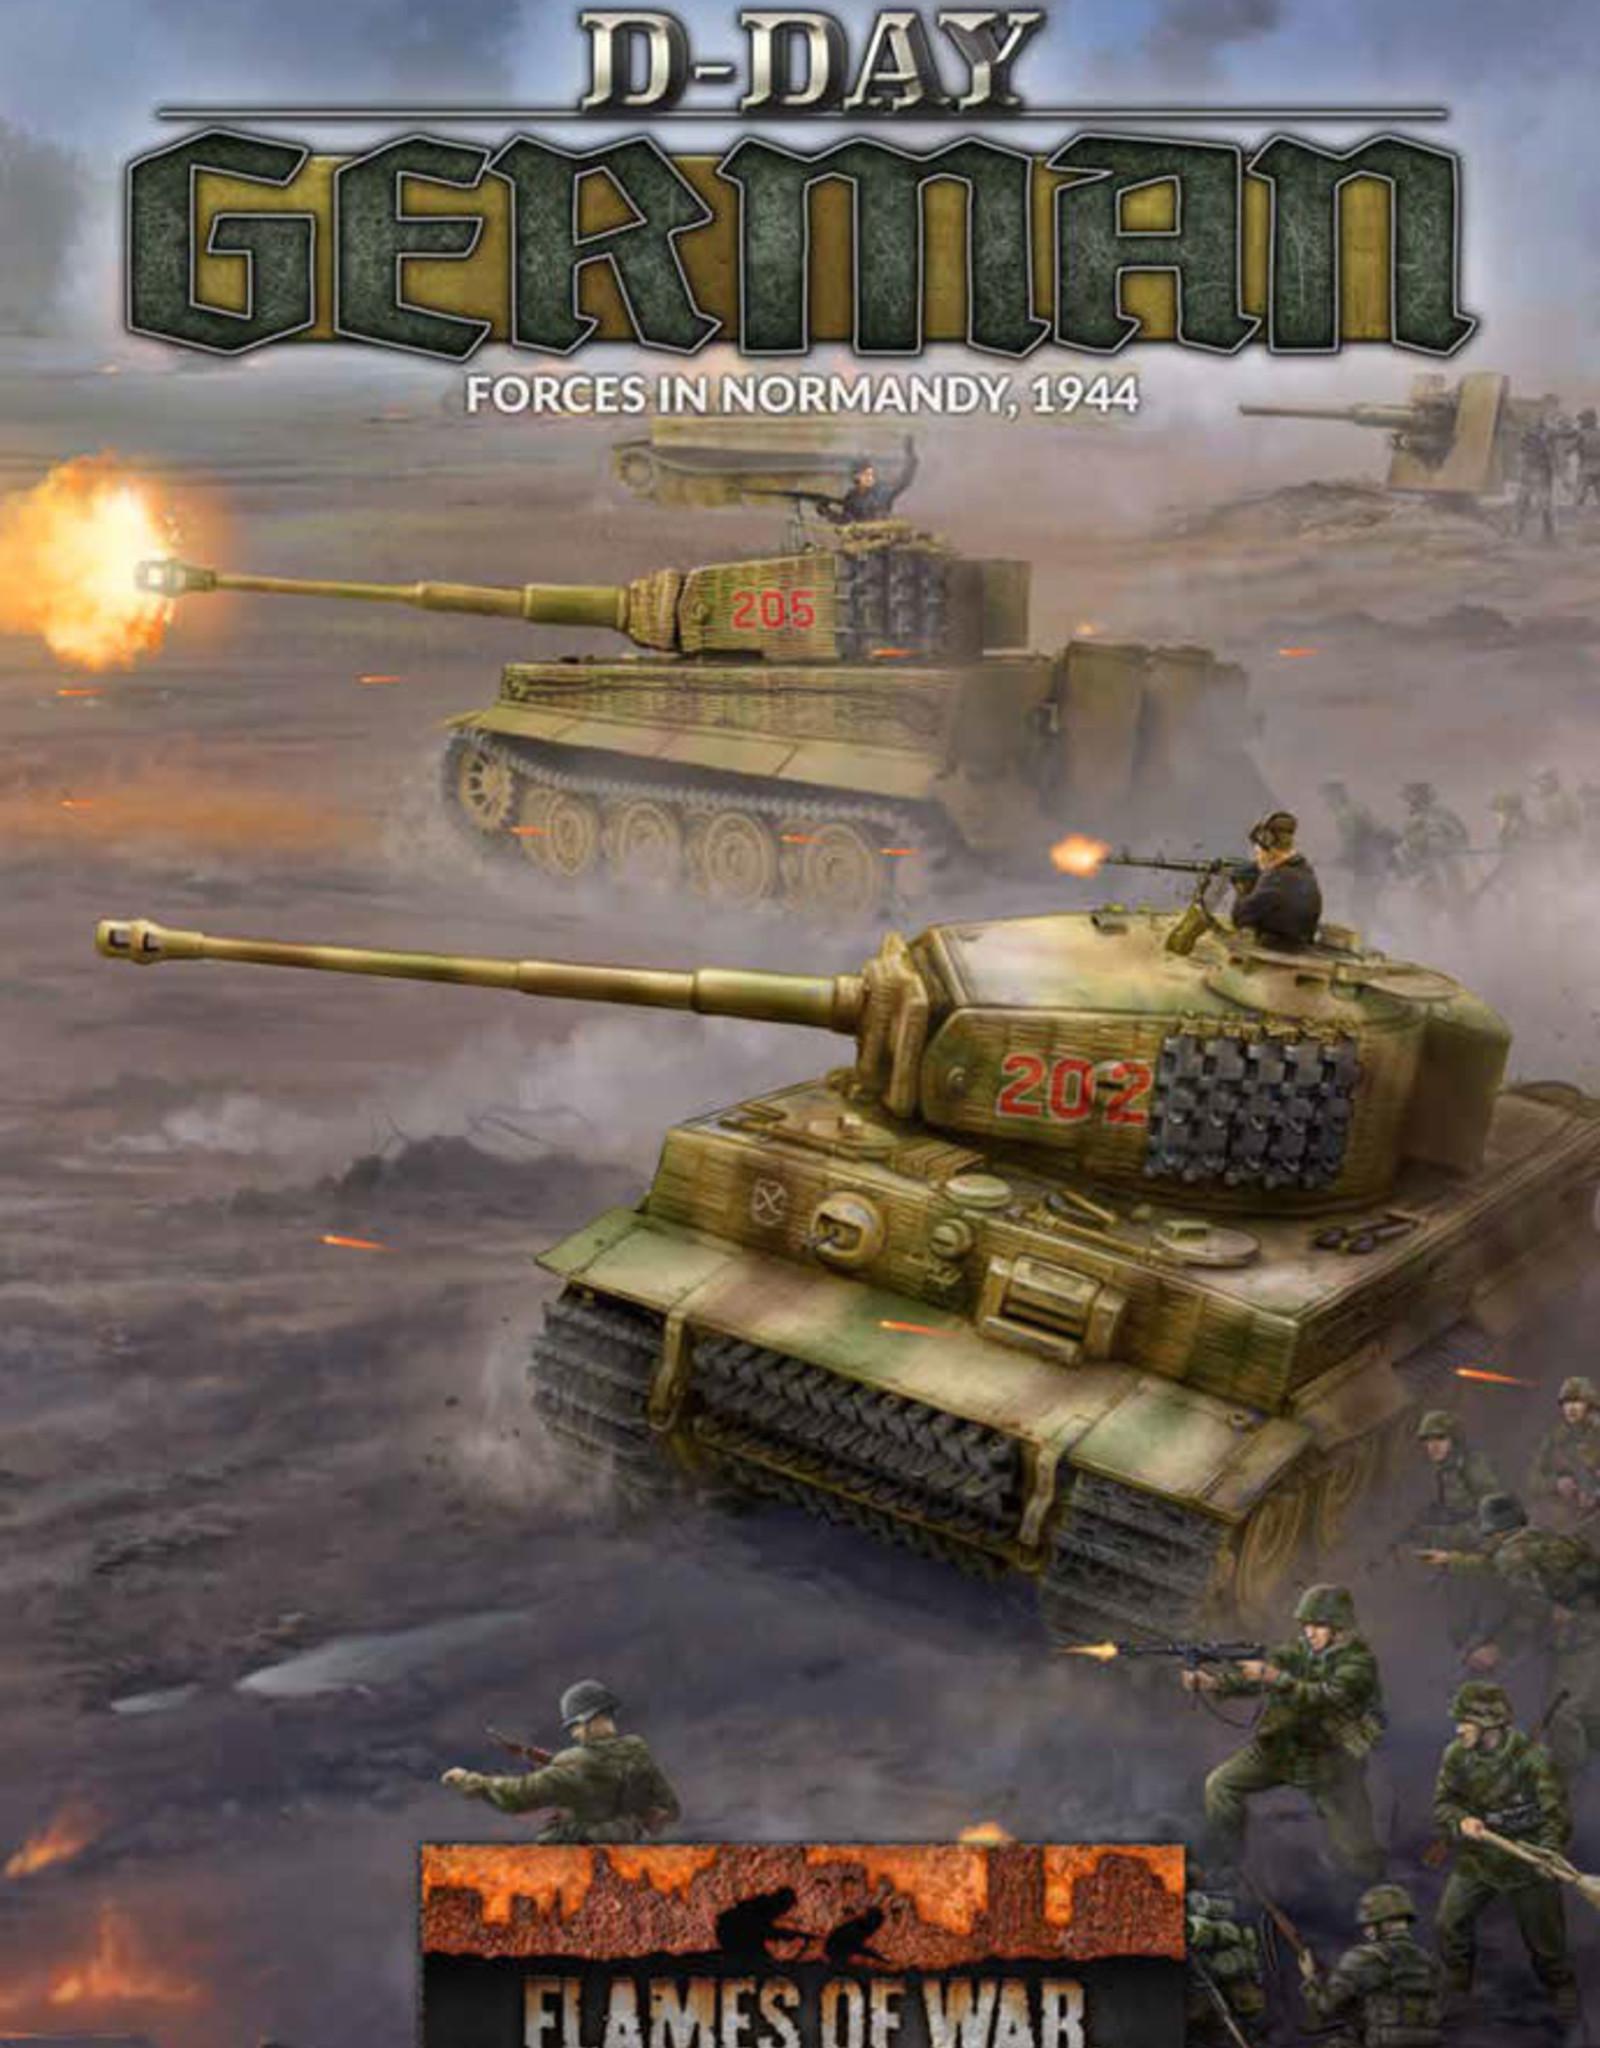 Battlefront Miniatures Ltd D-Day: Germans